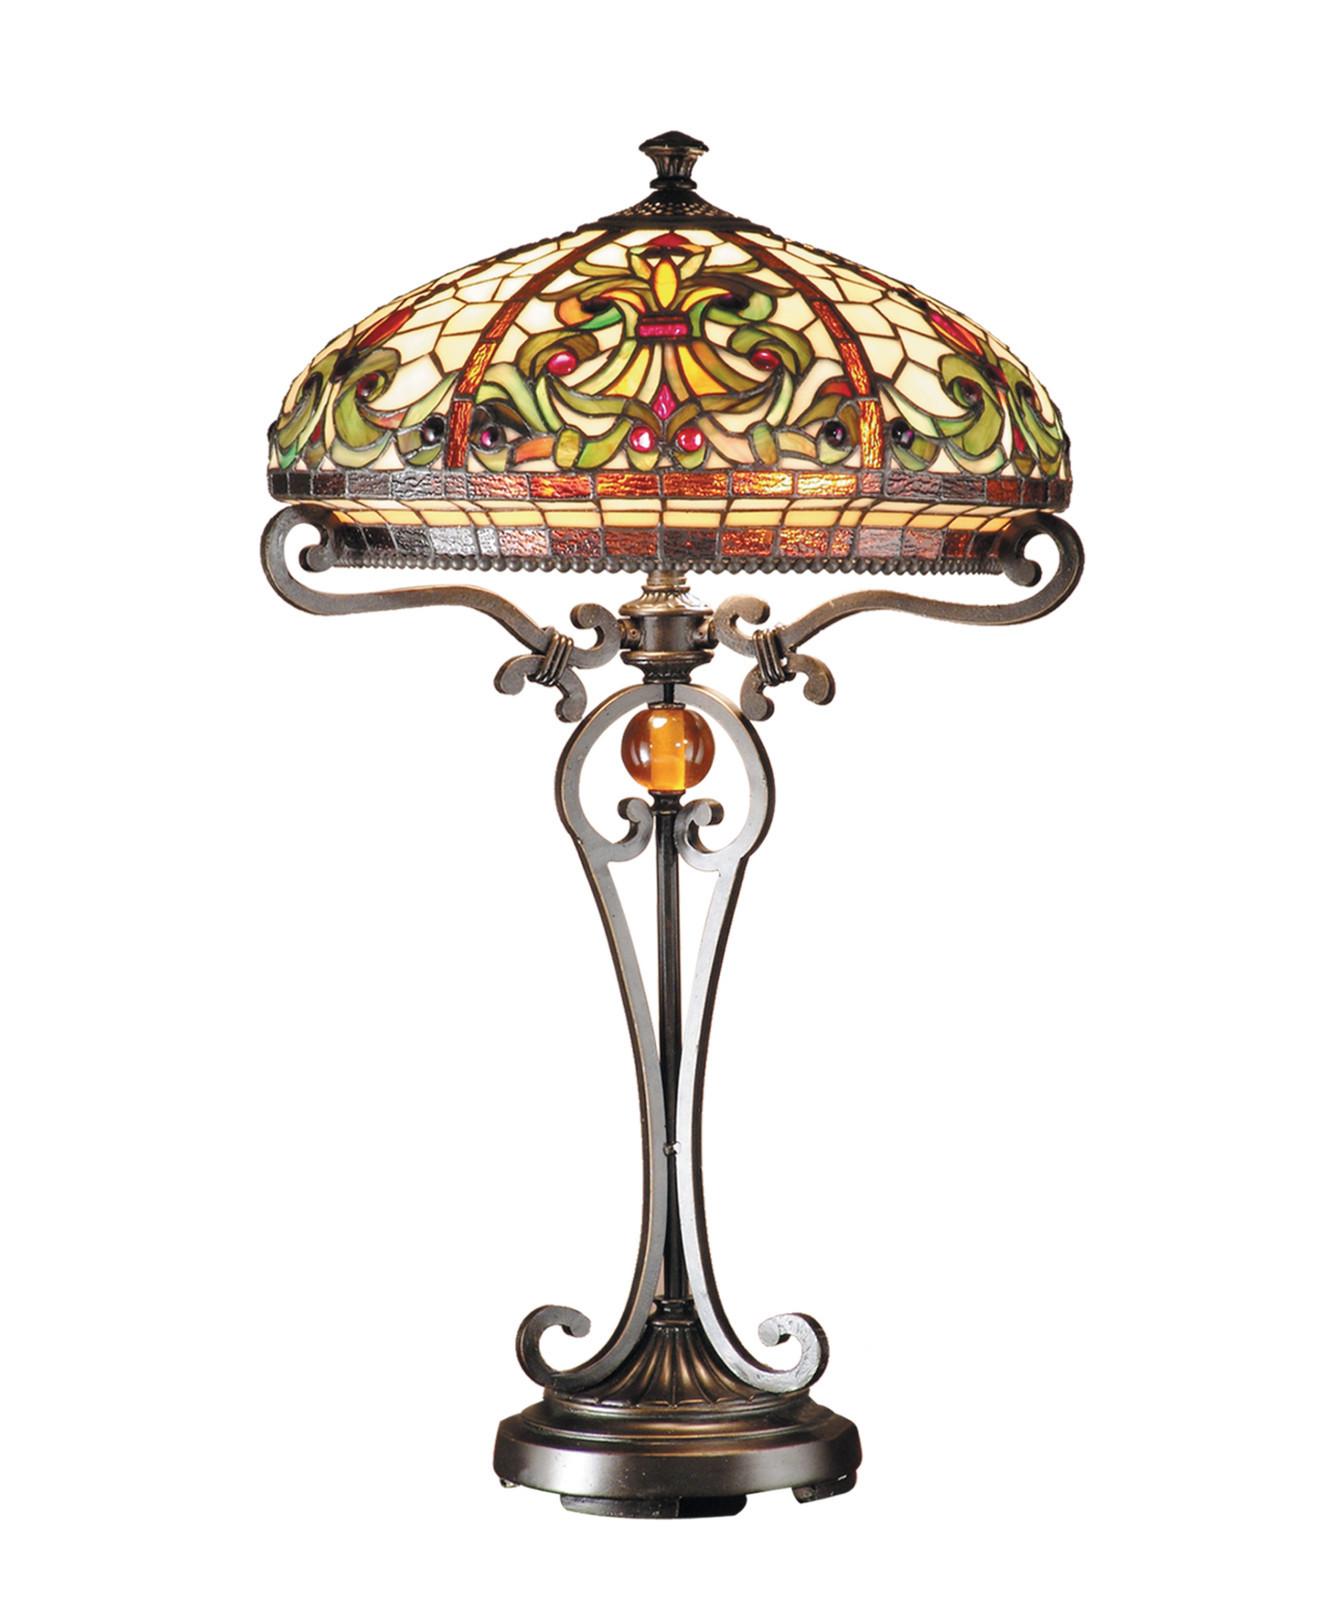 Tiffany Light Shades Ceiling Warisan Lighting